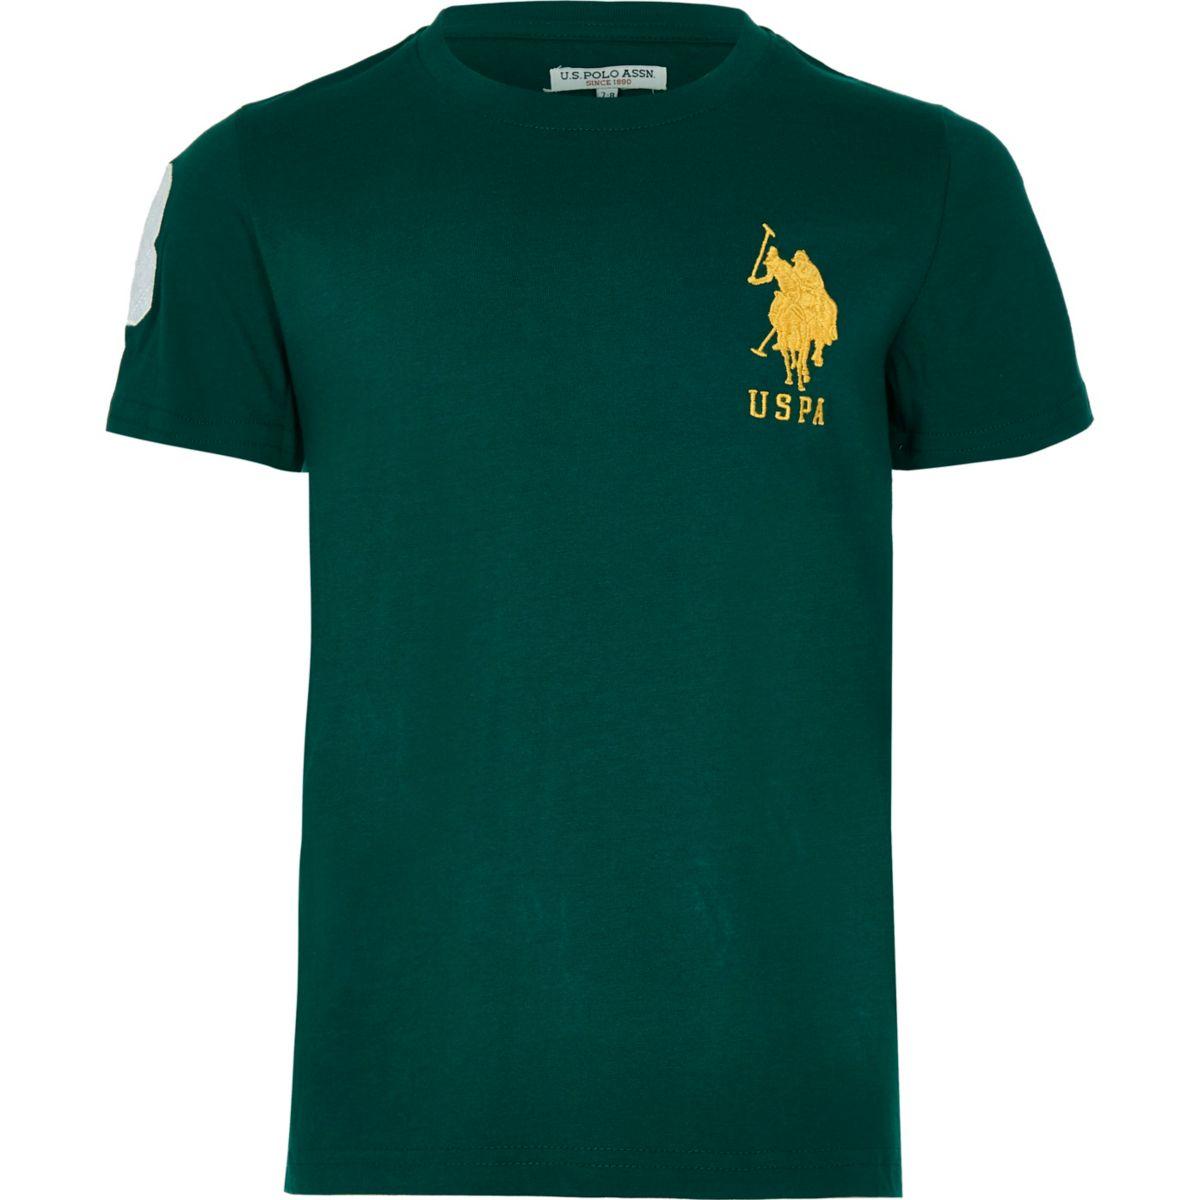 Boys U.S. Polo Assn. green T-shirt